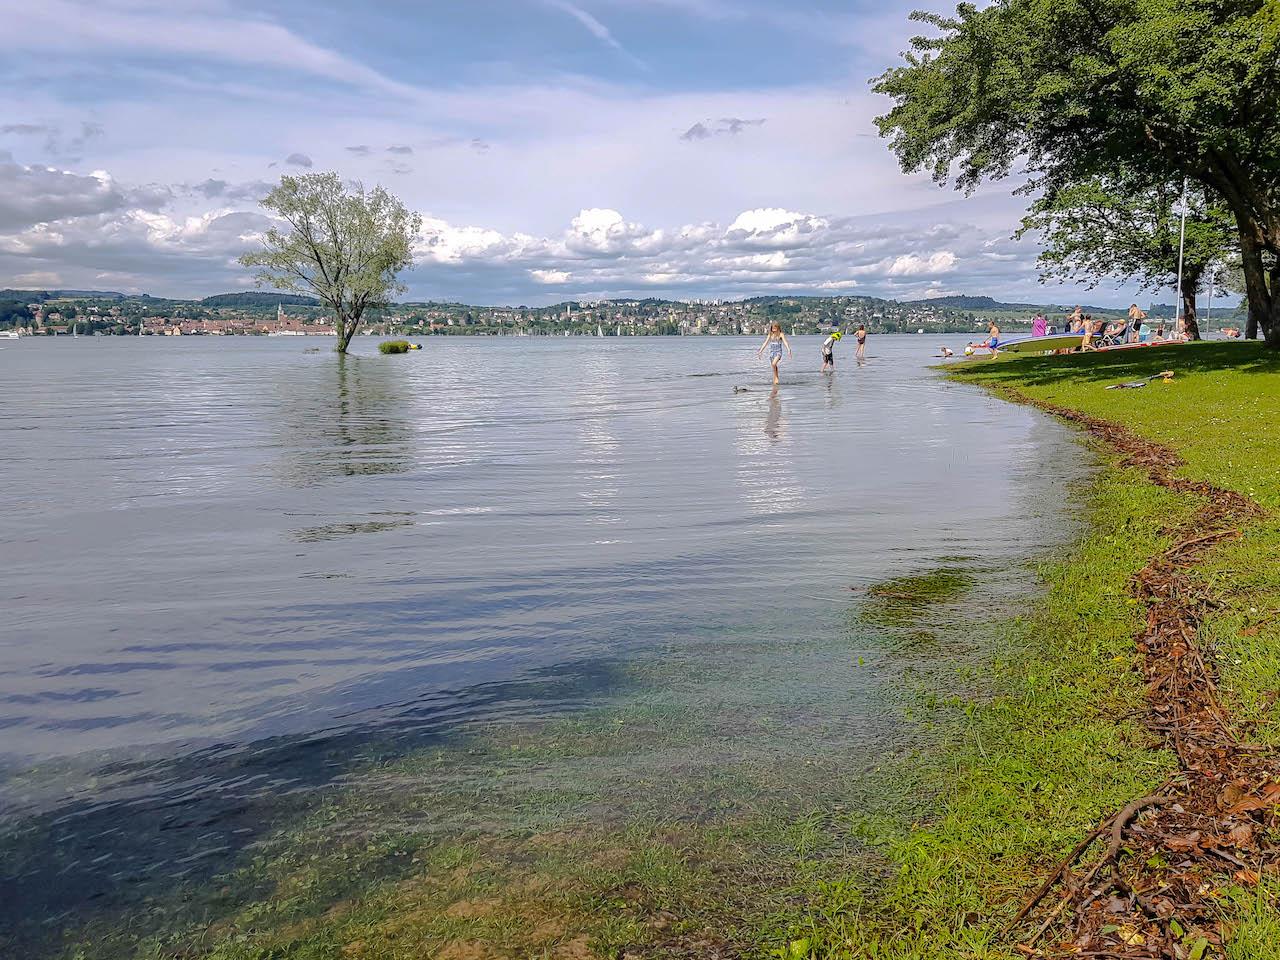 Strandbad Dingelsdorf am Bodensee.